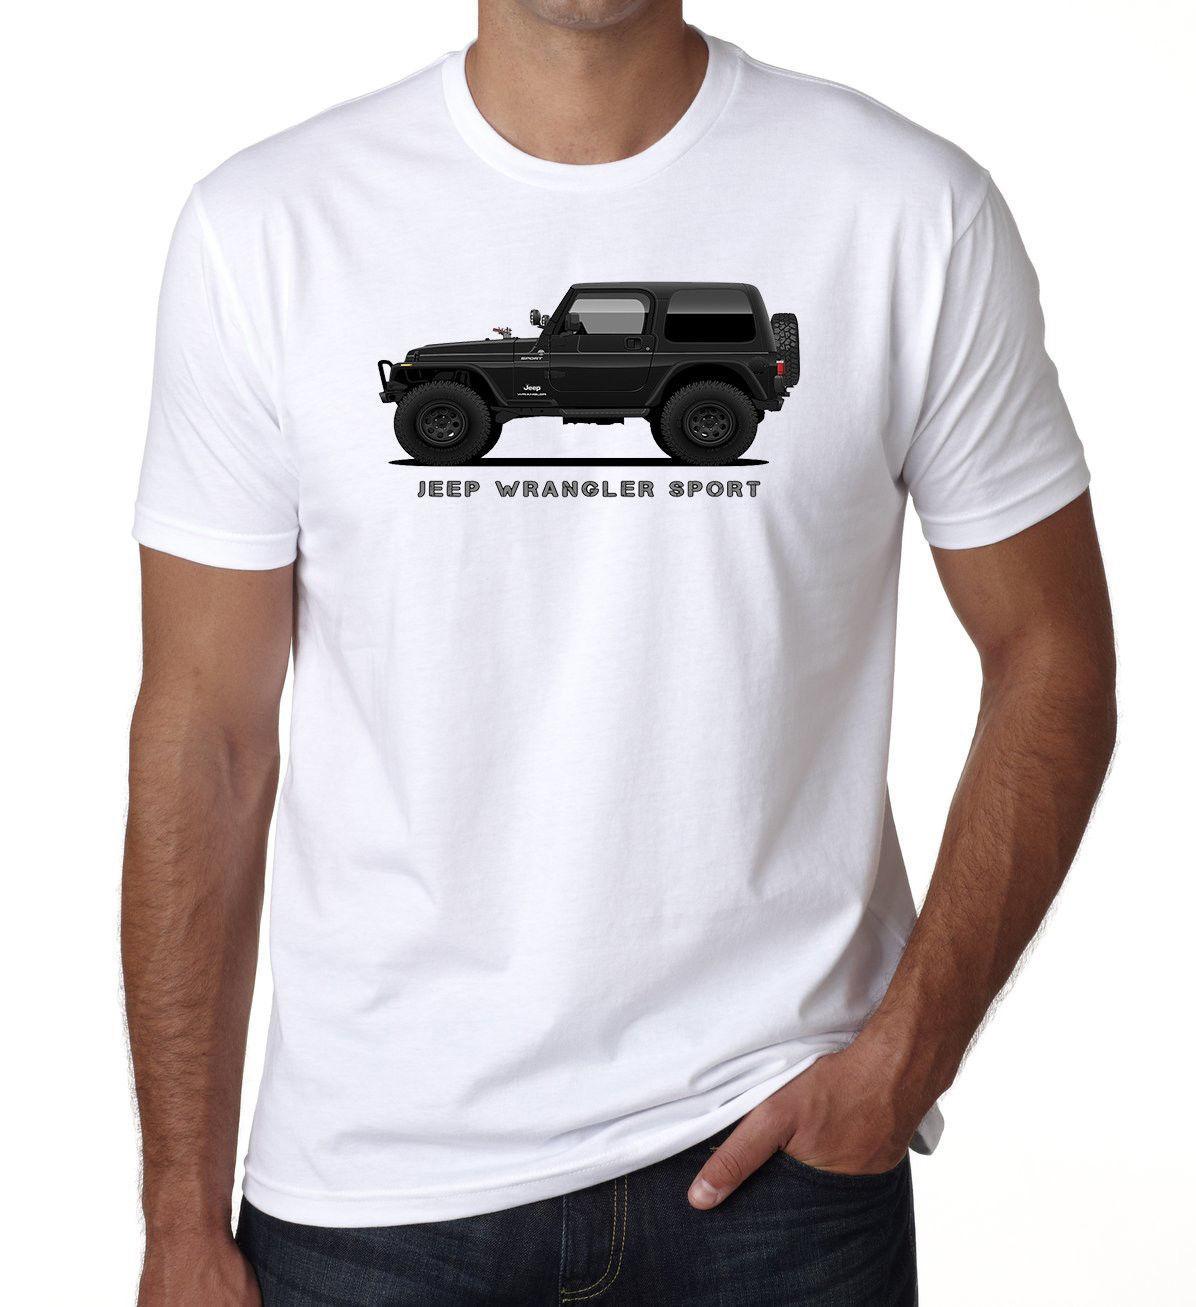 bc0b31661 Jeep WRANGLER Sports Mens T Shirt Kids 4 X 4 Cross Country Car White  TshirtDTFunny Casual Tee Buy Shirt Ti Shirt From Luckytshirt, $12.96|  DHgate.Com